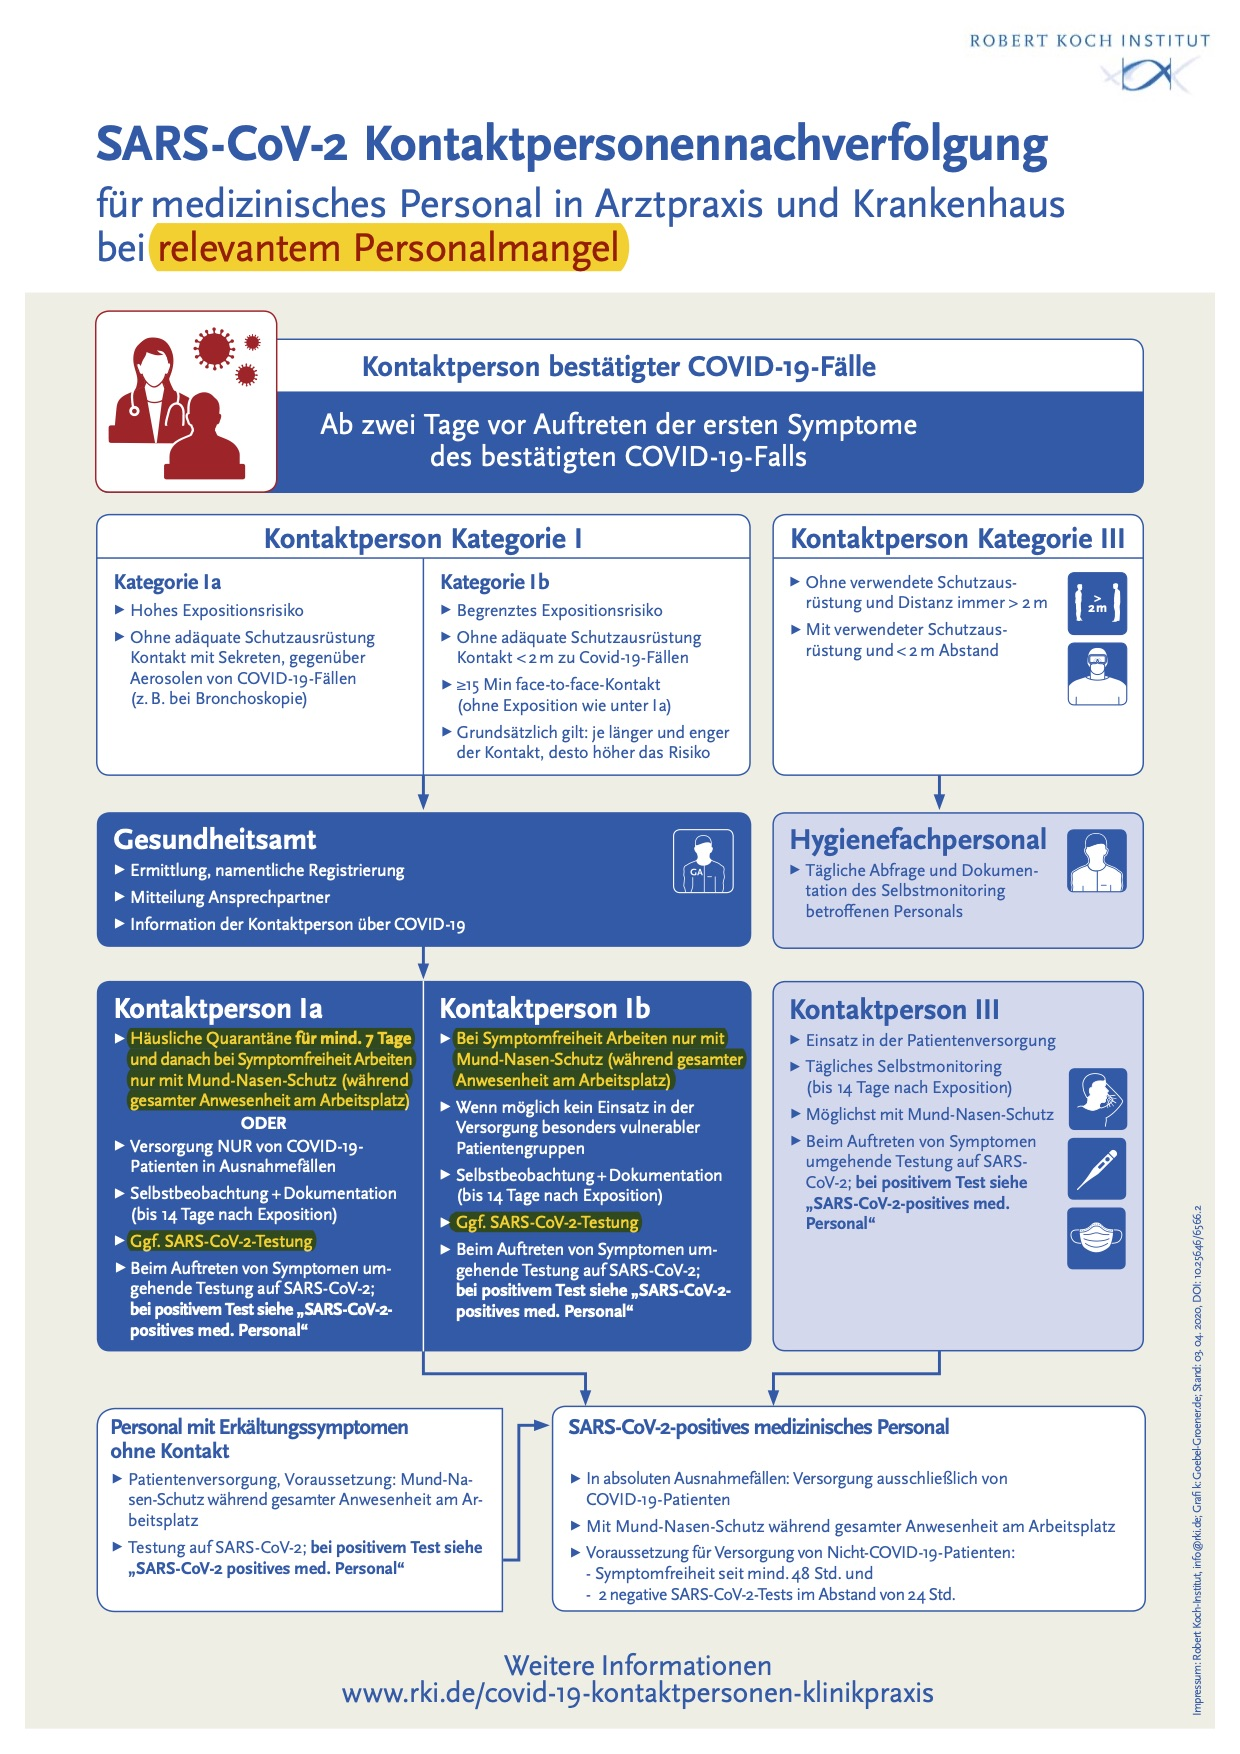 Infografik Kontaktp ersonennachverfolgung für med. Personal 2